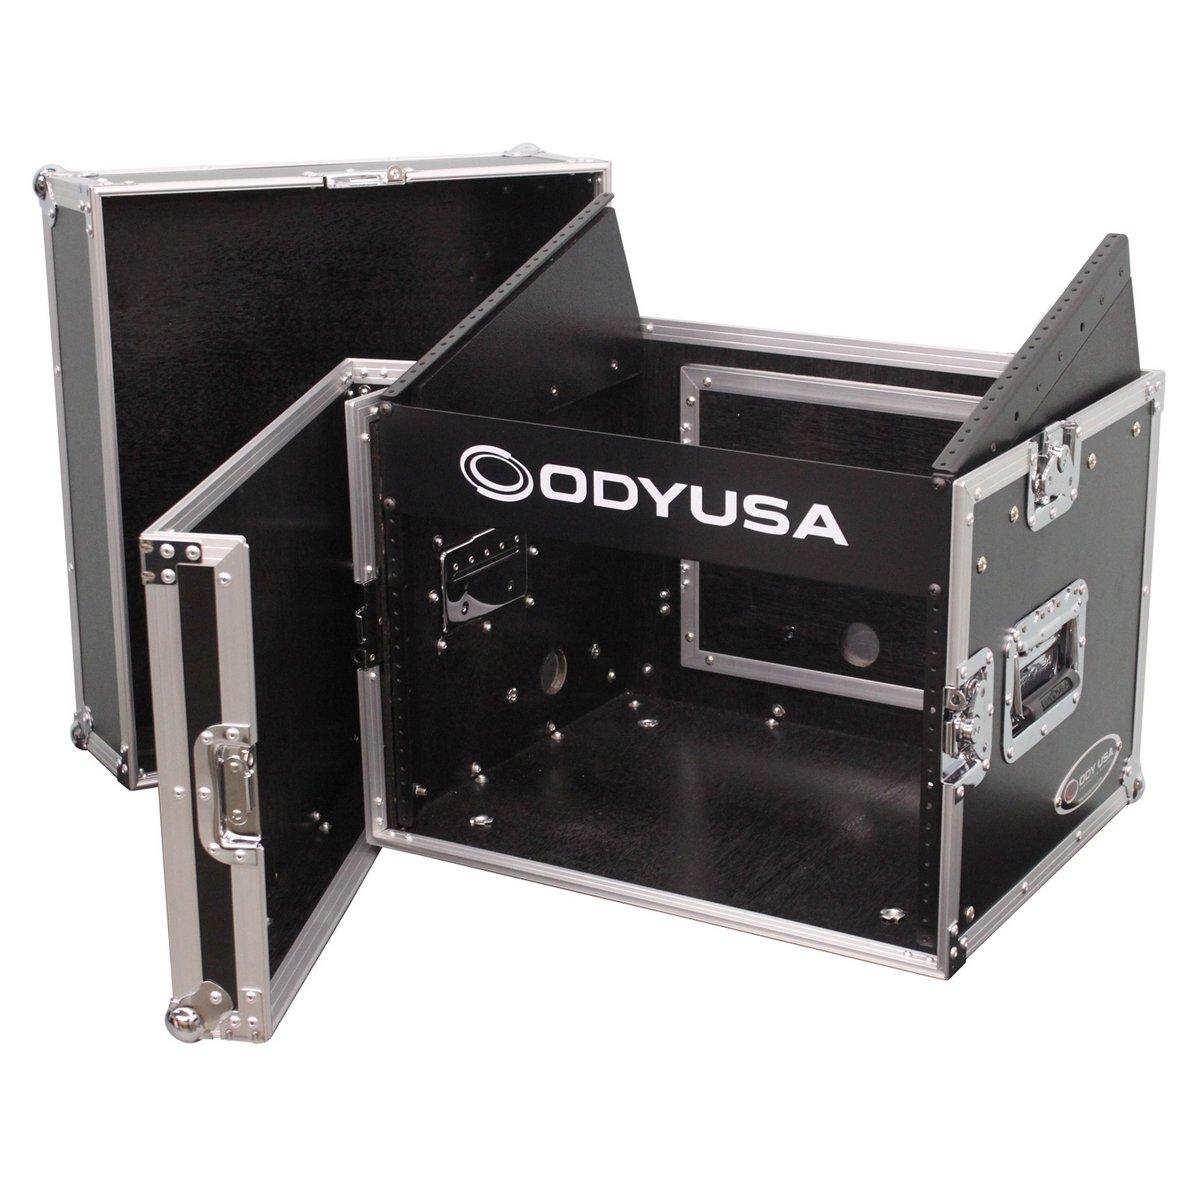 Odyssey Cases FR0806 | 8 Unit Top Slanted Rack Space 6 Unit Bottom Vertical Rack Space